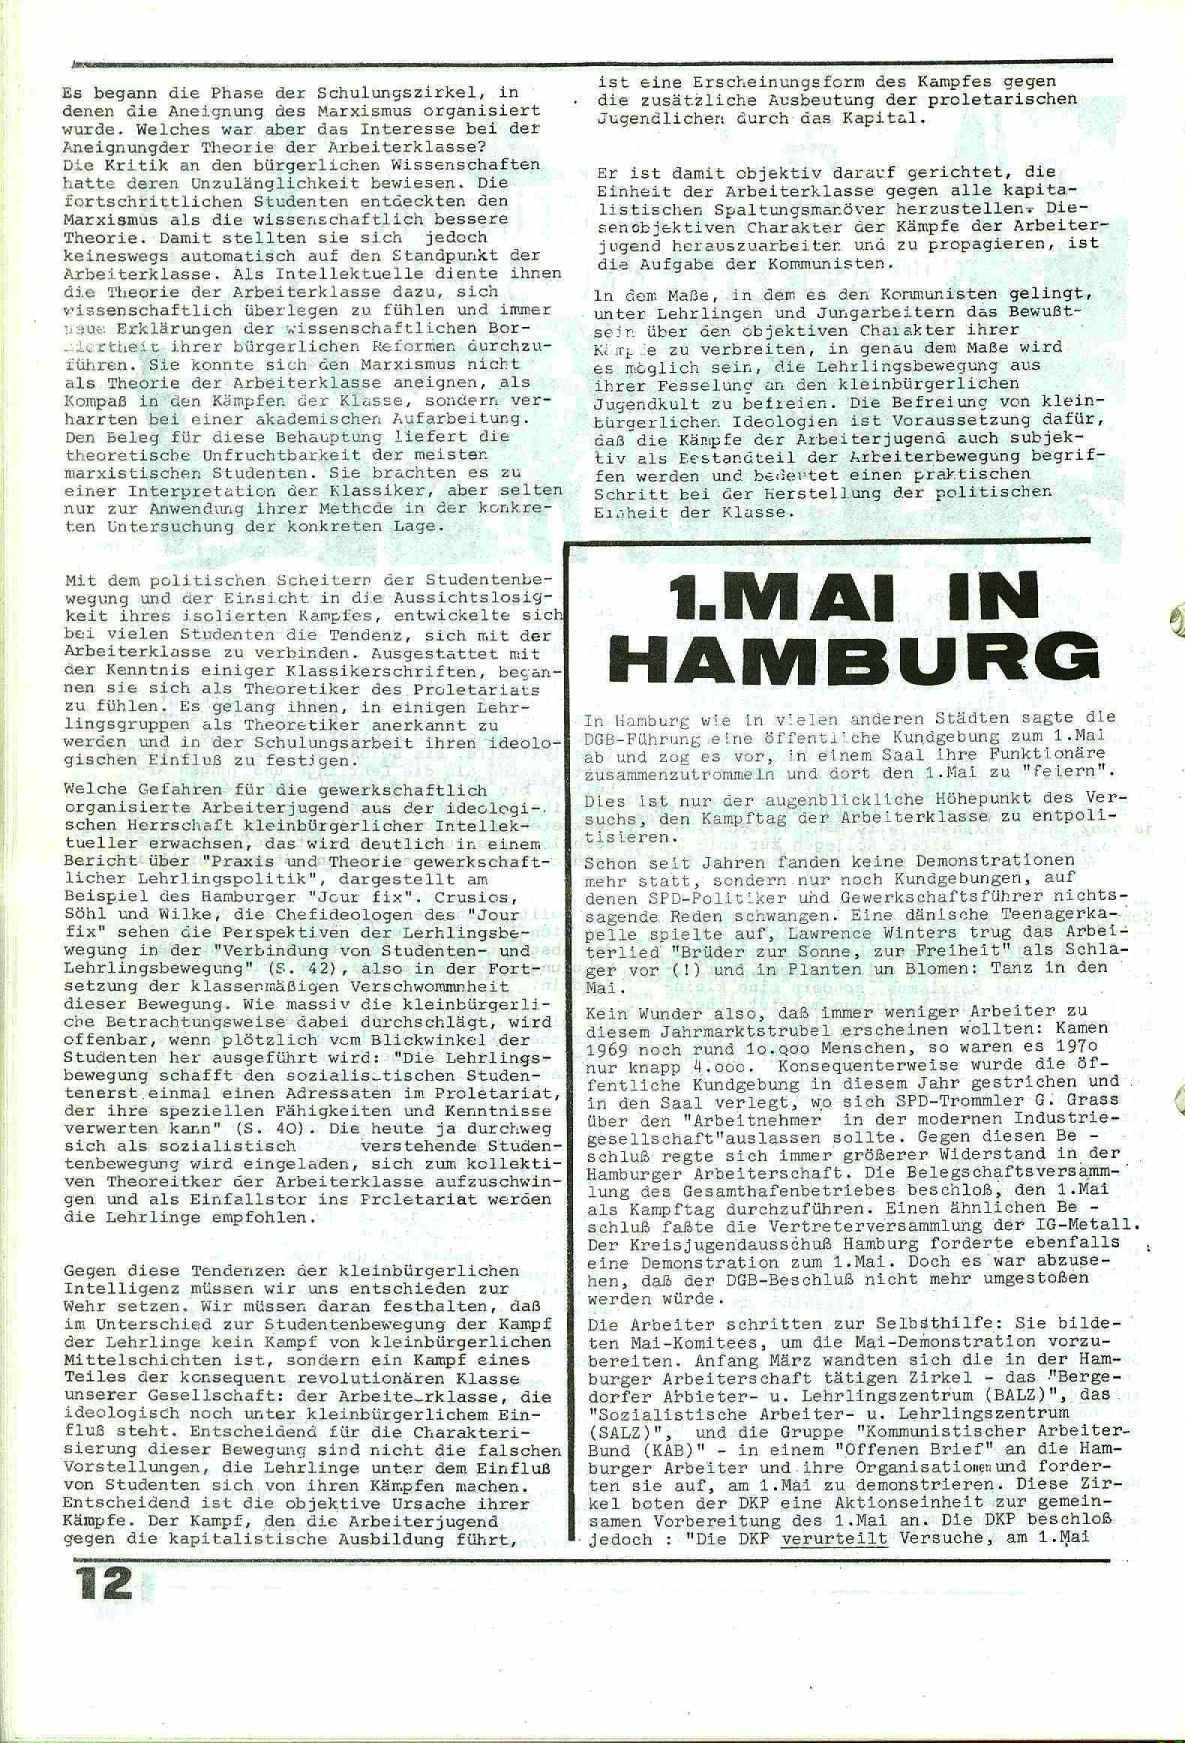 Bremen_KAK101